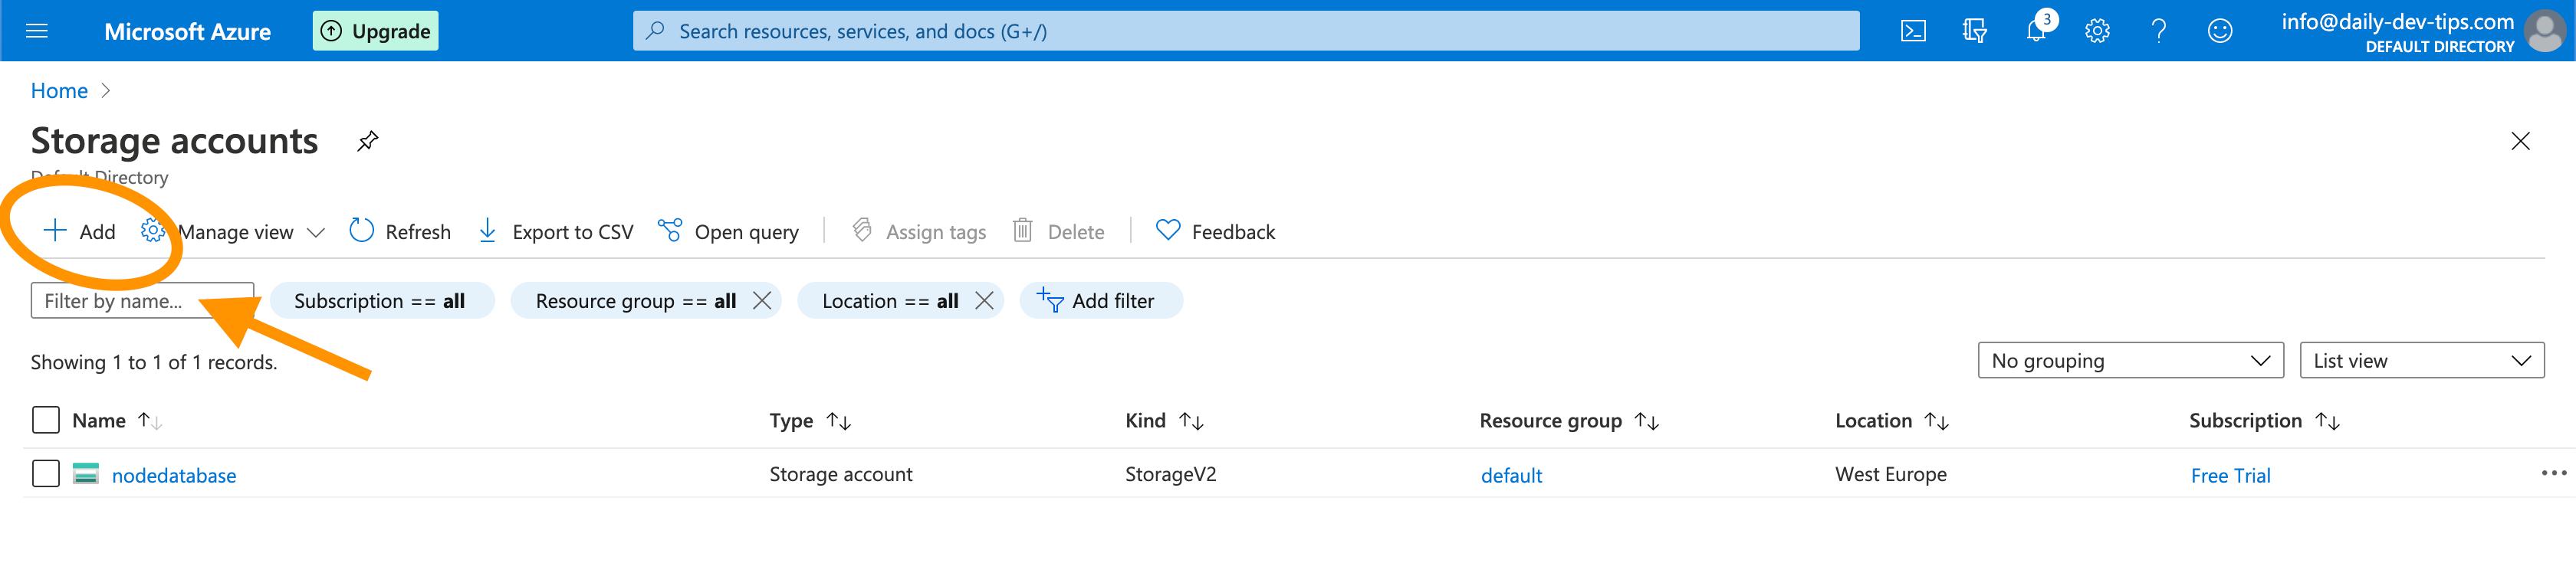 Azure add new Storage Account